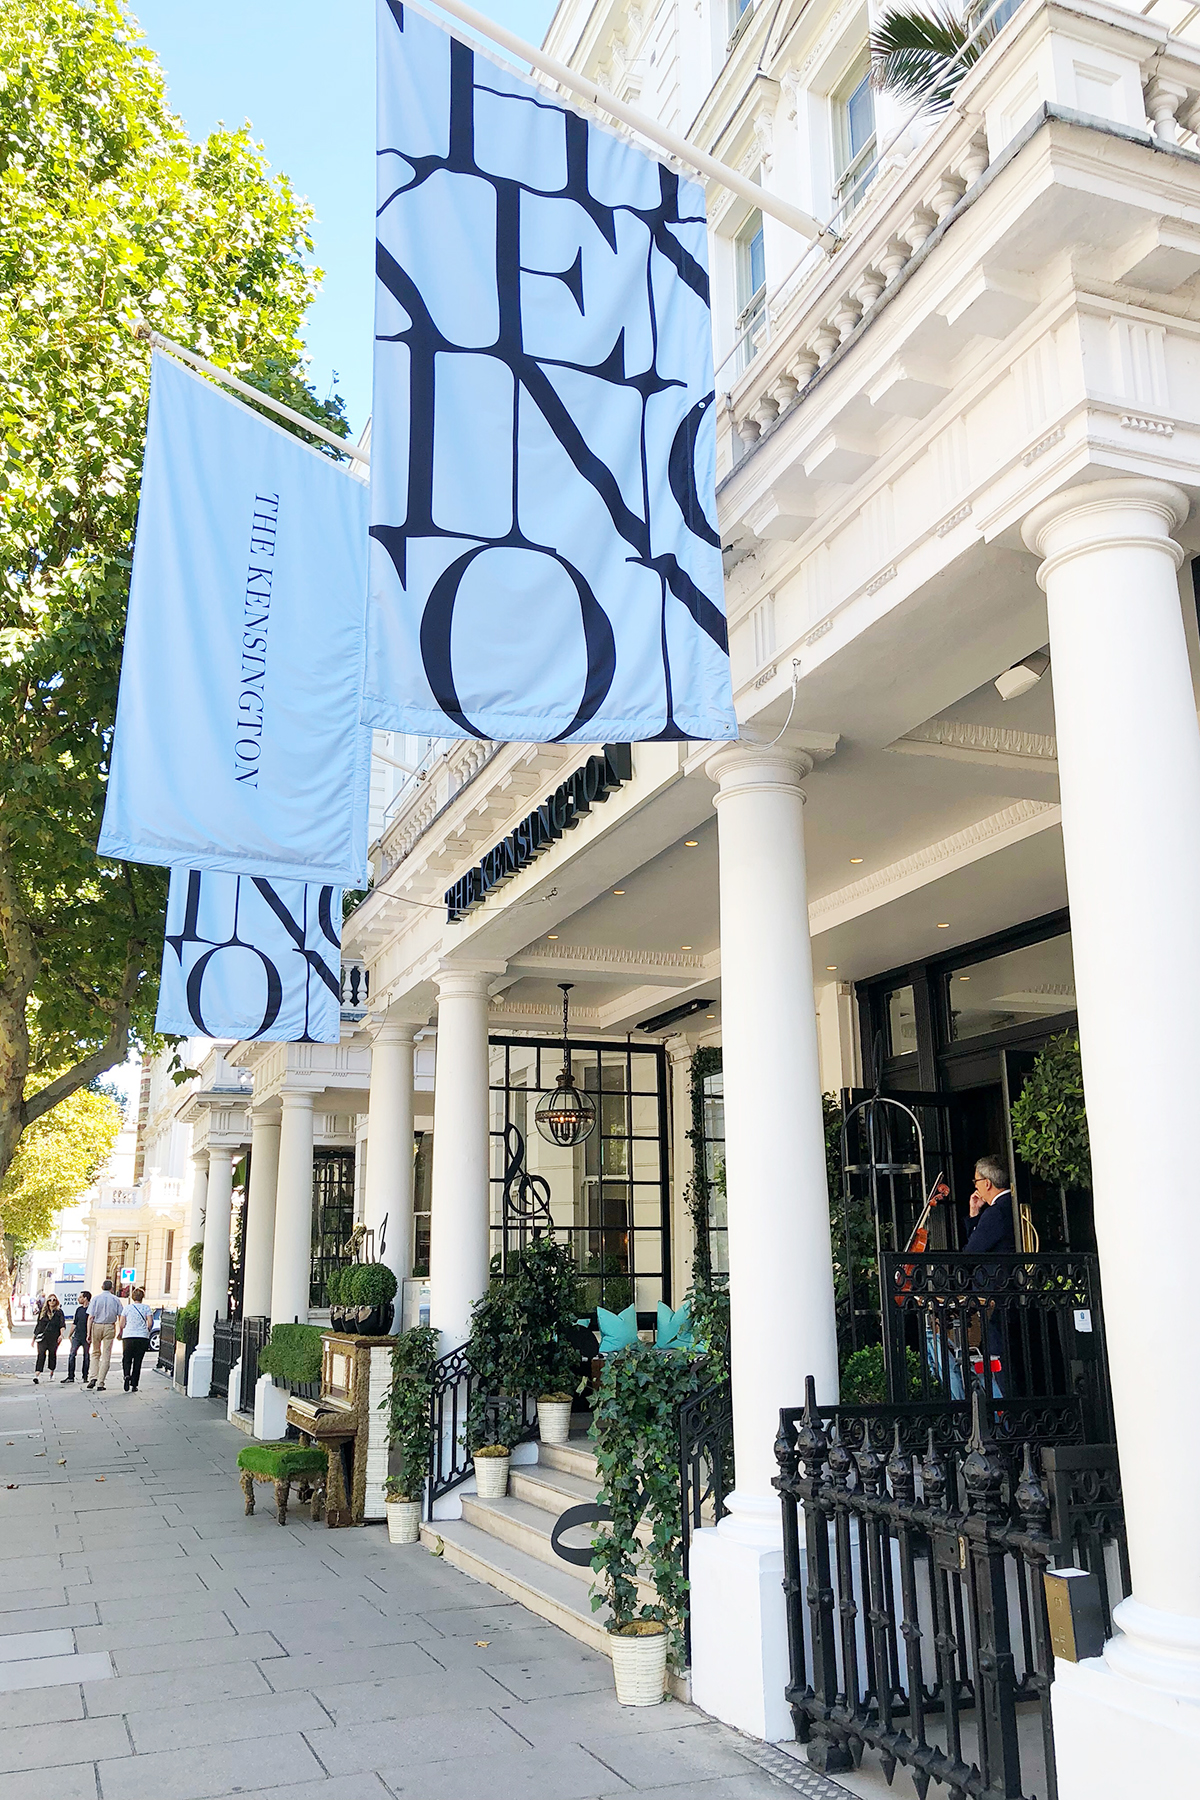 The hotel kensington london